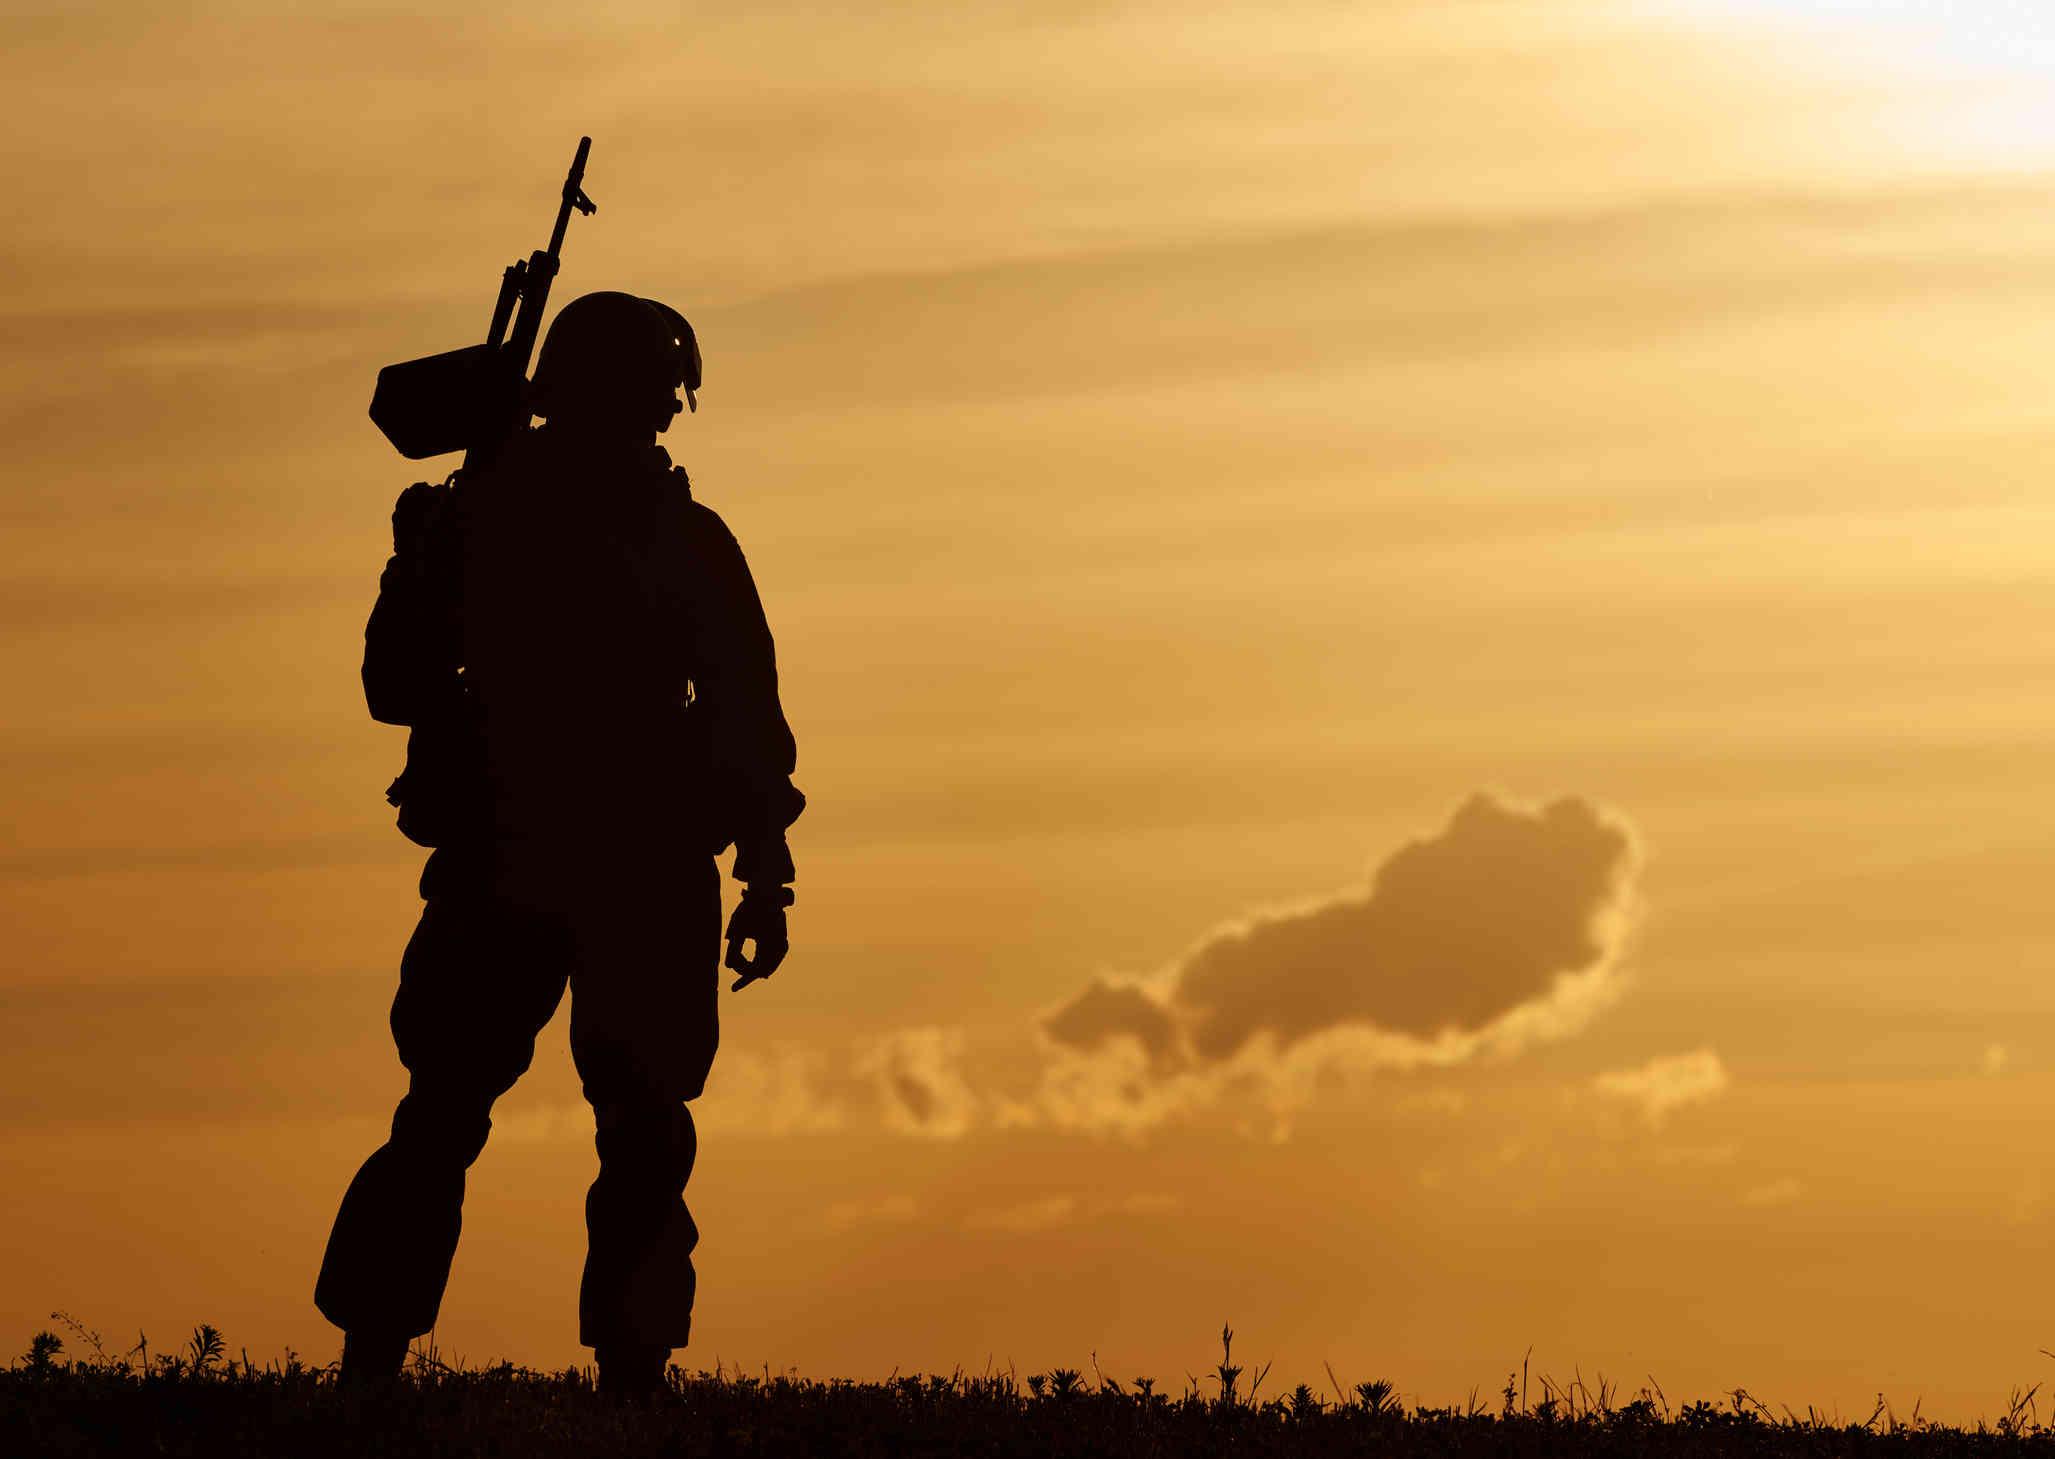 Assistive Technologies: Exploring a Stable Clientele Among Veterans